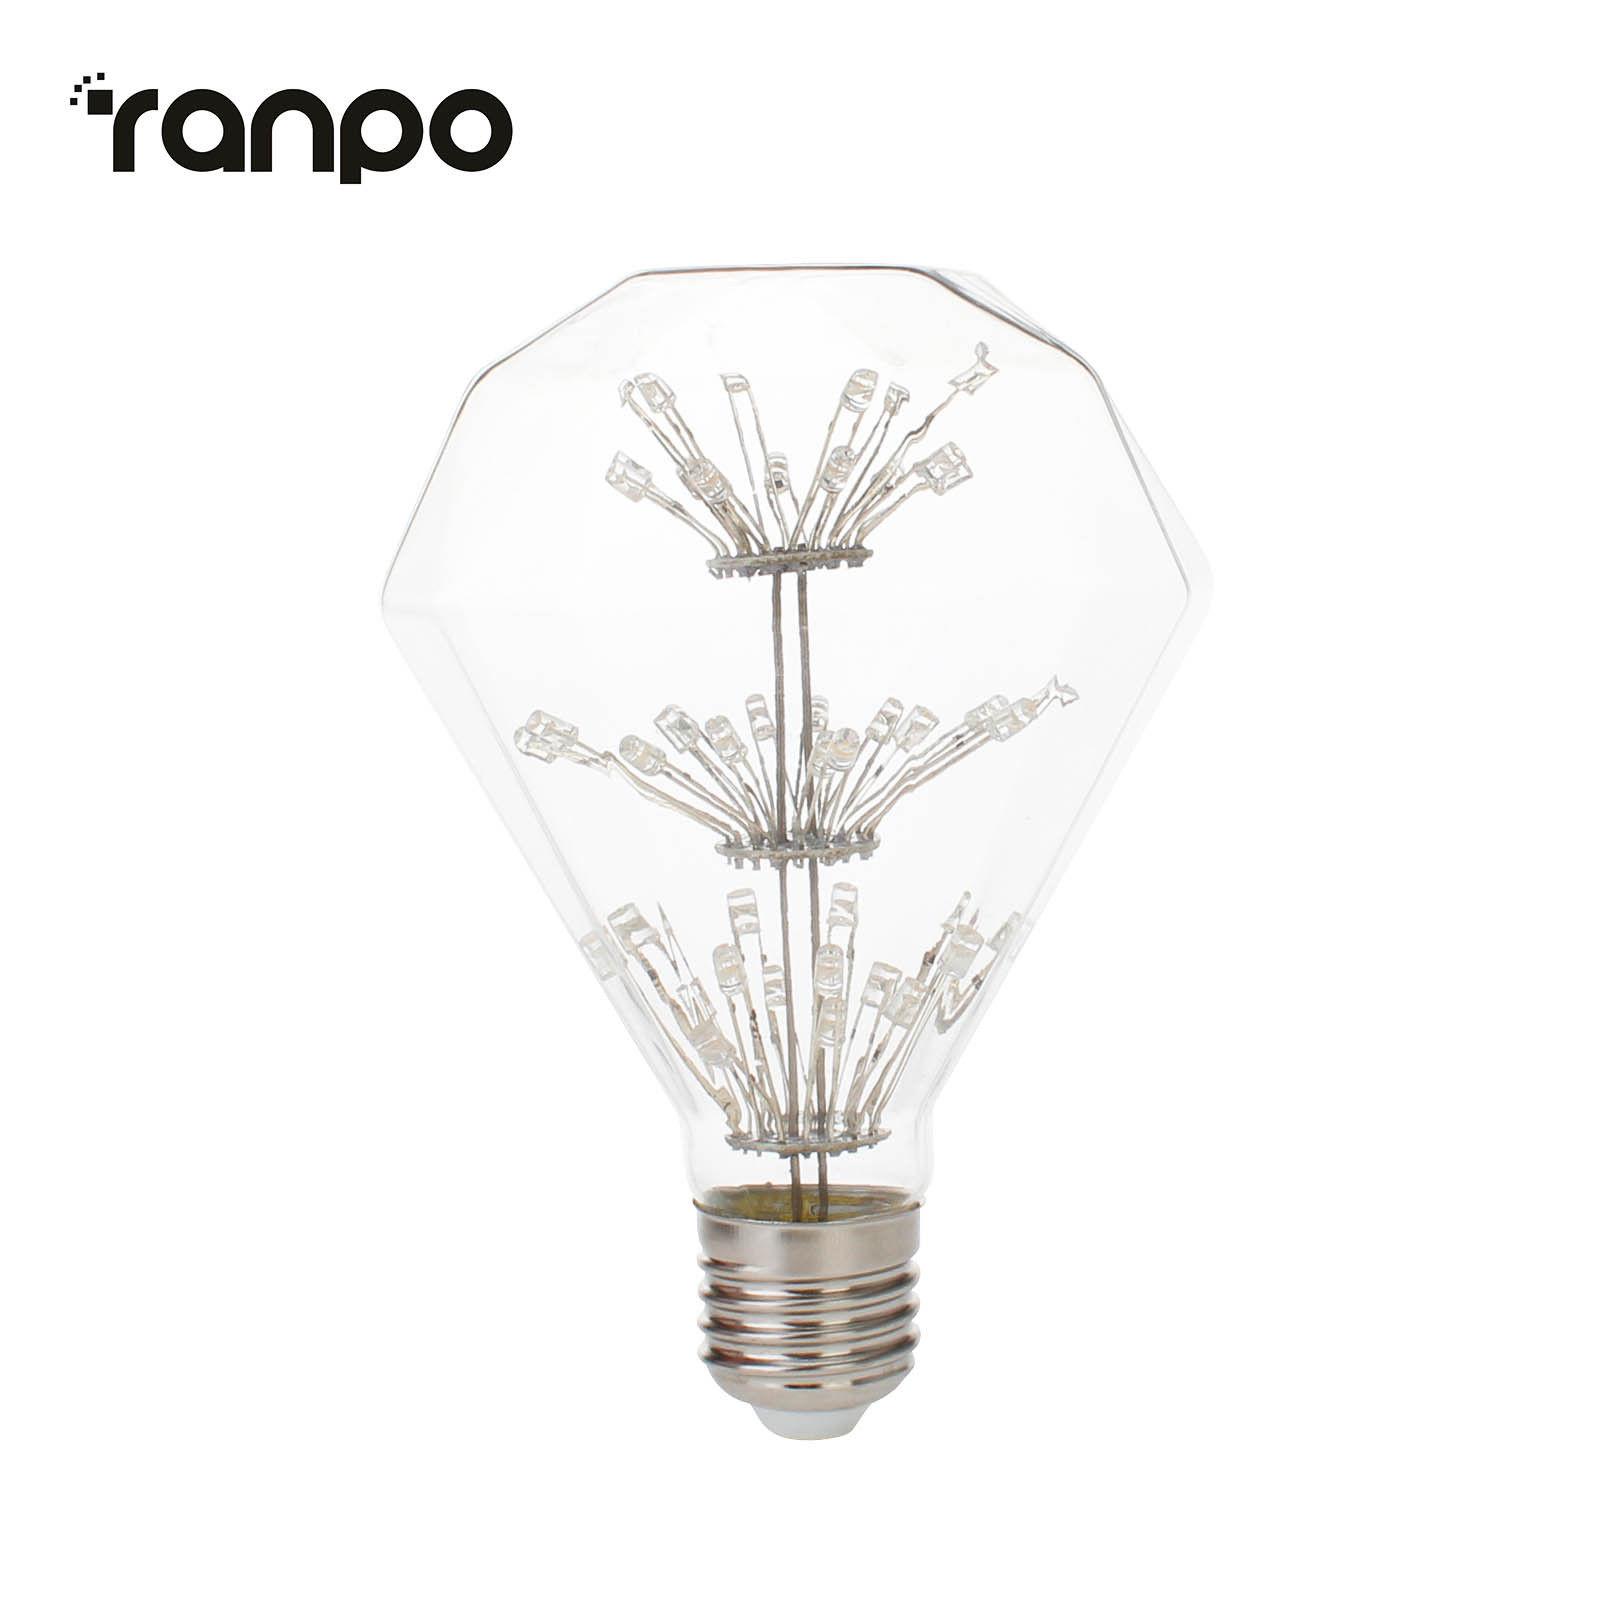 E27 Edison Led Filament Bulb G125 St64 A60 Star Lights